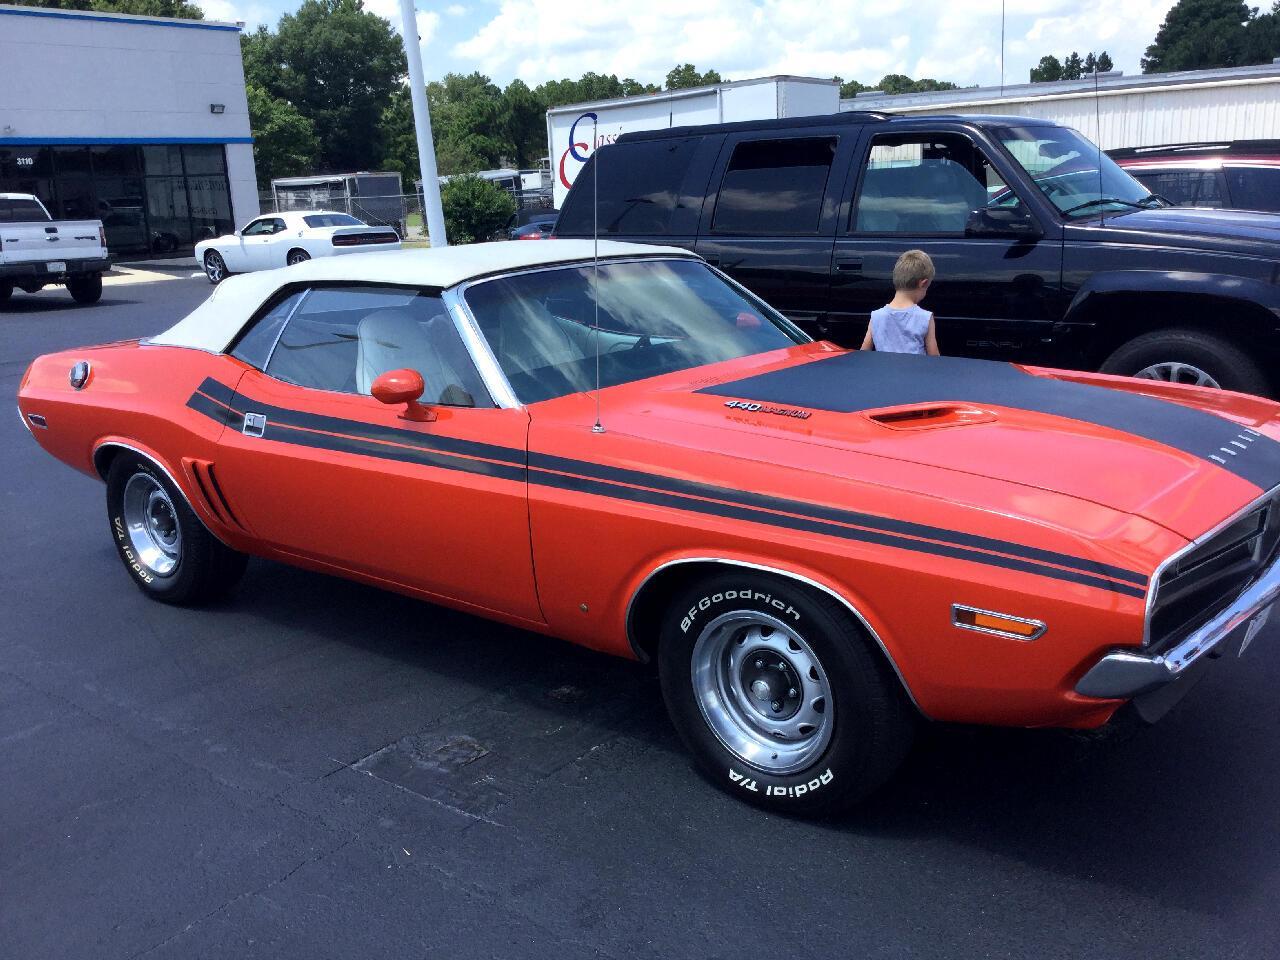 1971 Dodge Challenger (CC-1207915) for sale in Greenville, North Carolina